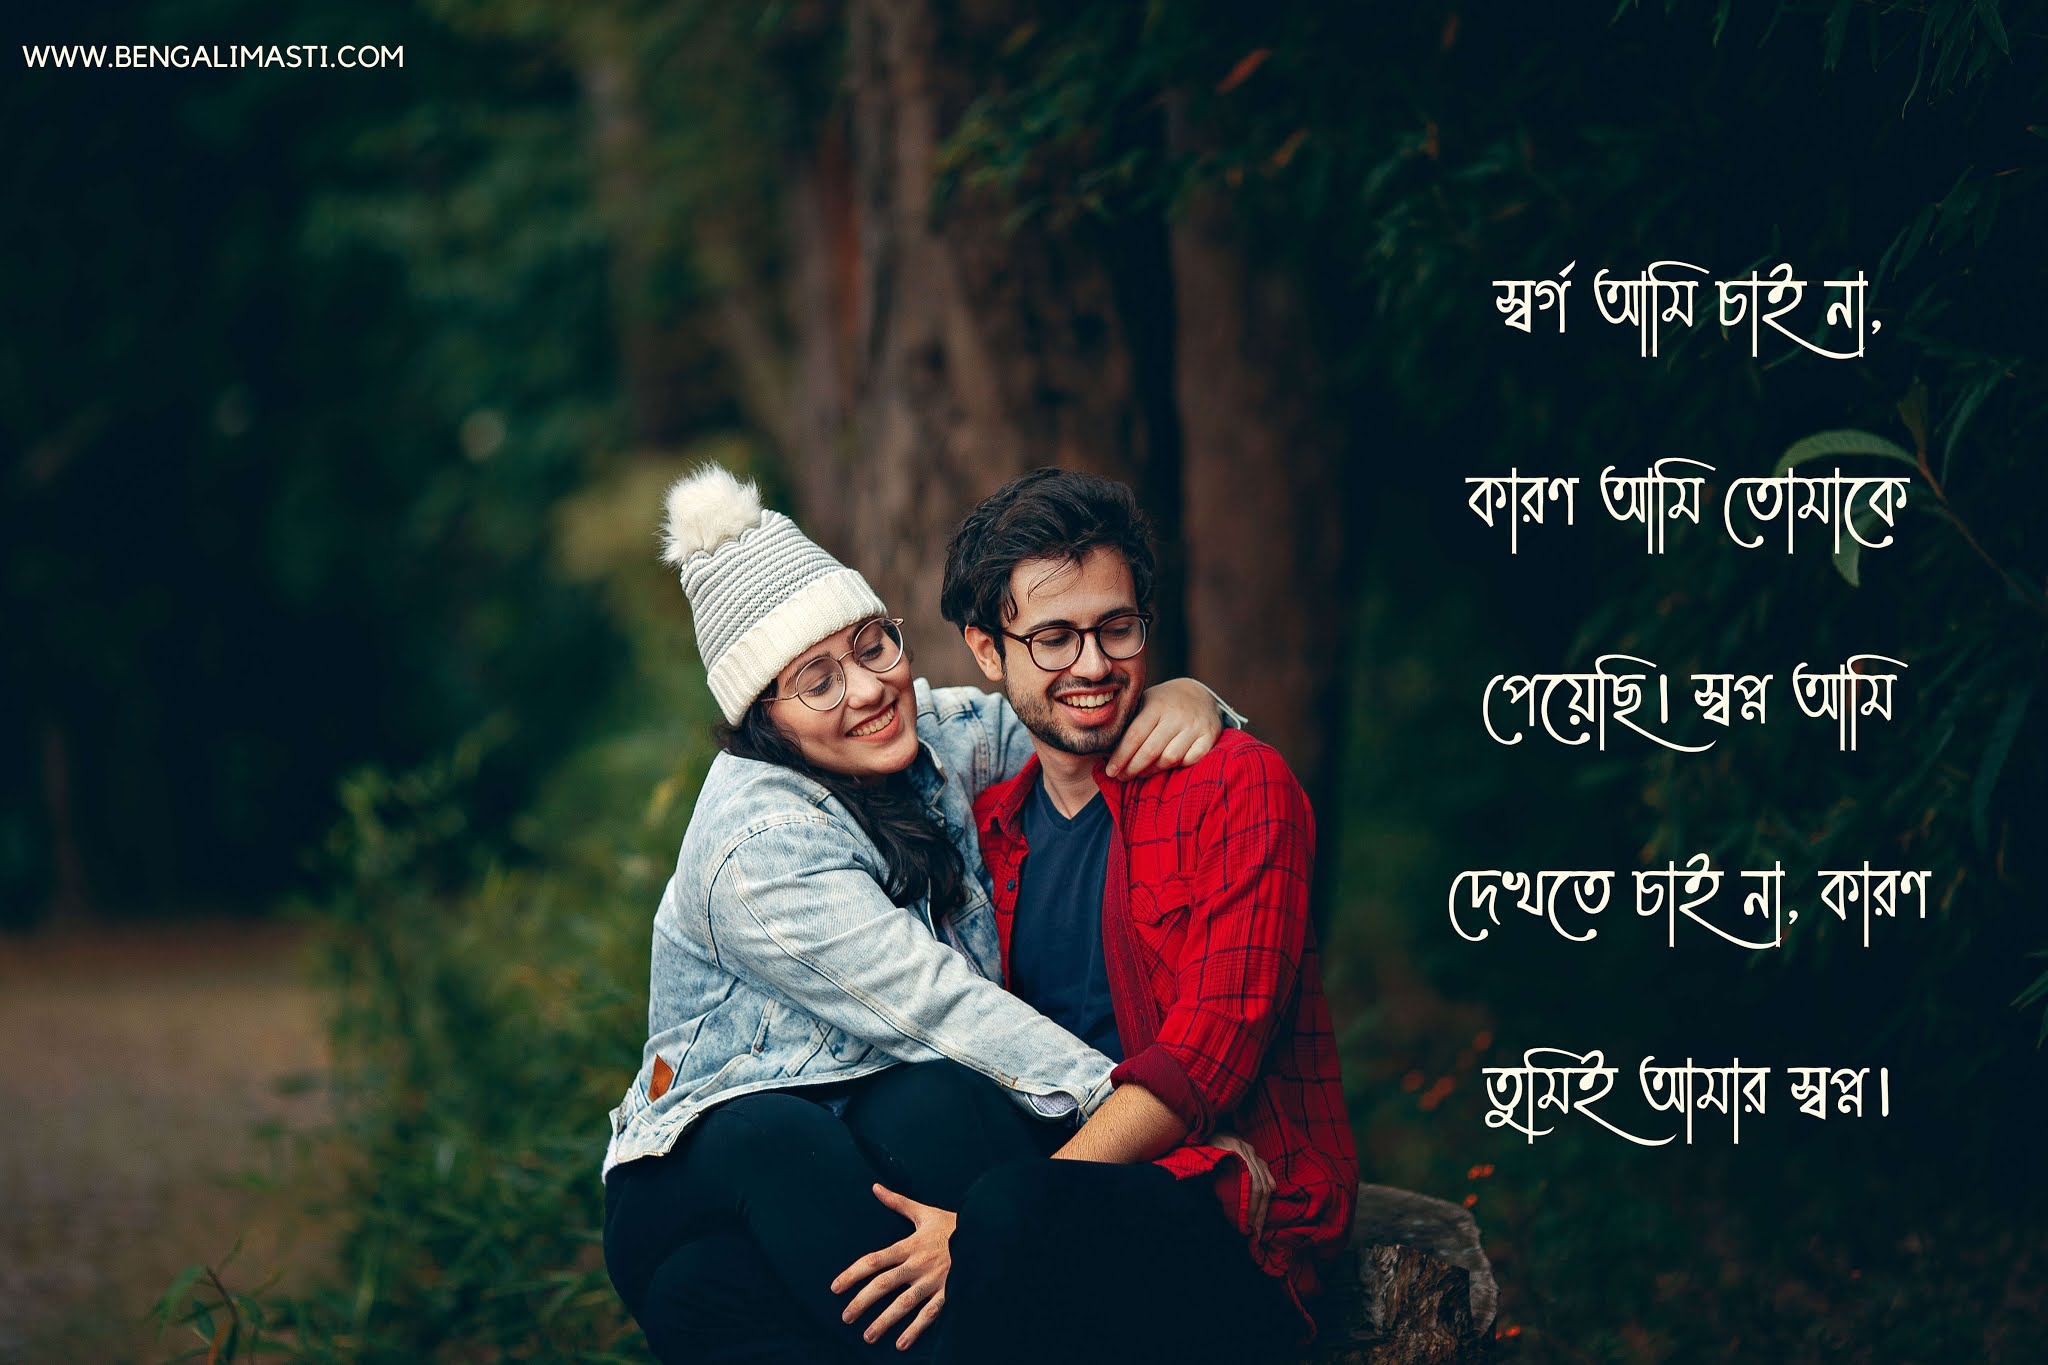 Bengali Love caption